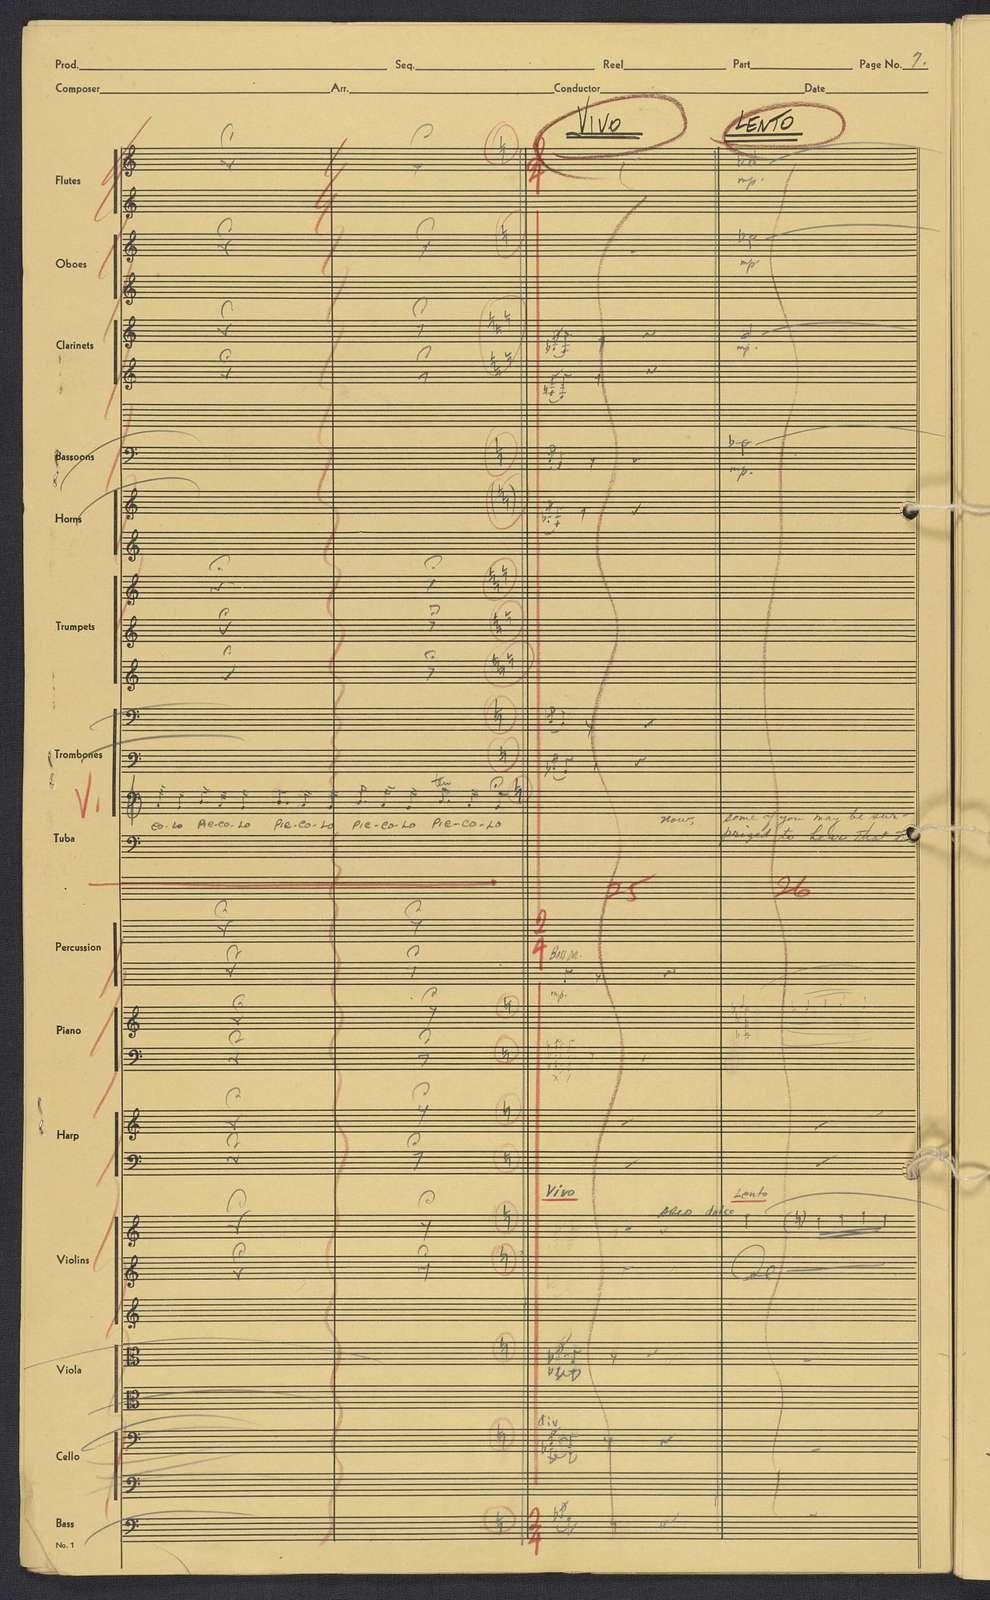 The  Liddle Fiddle [Little Fiddle]